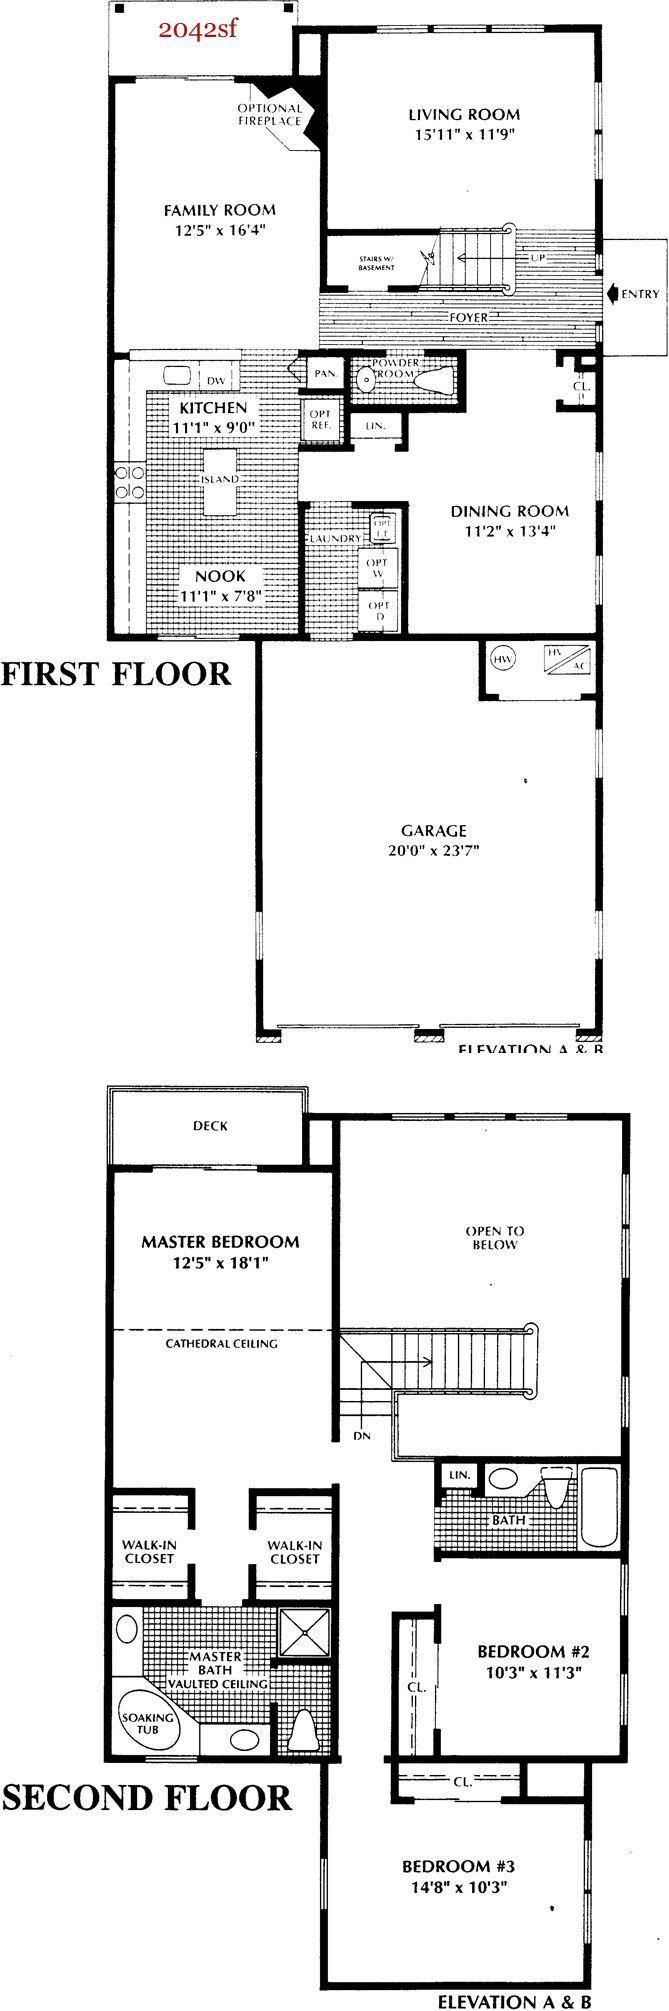 Lake Cushetunk Home Floorplans :: Lake Cushetunk Woods Whitehouse Station Hunterdon County NJ Real Estate Homes For Sale Jessica Wormeck